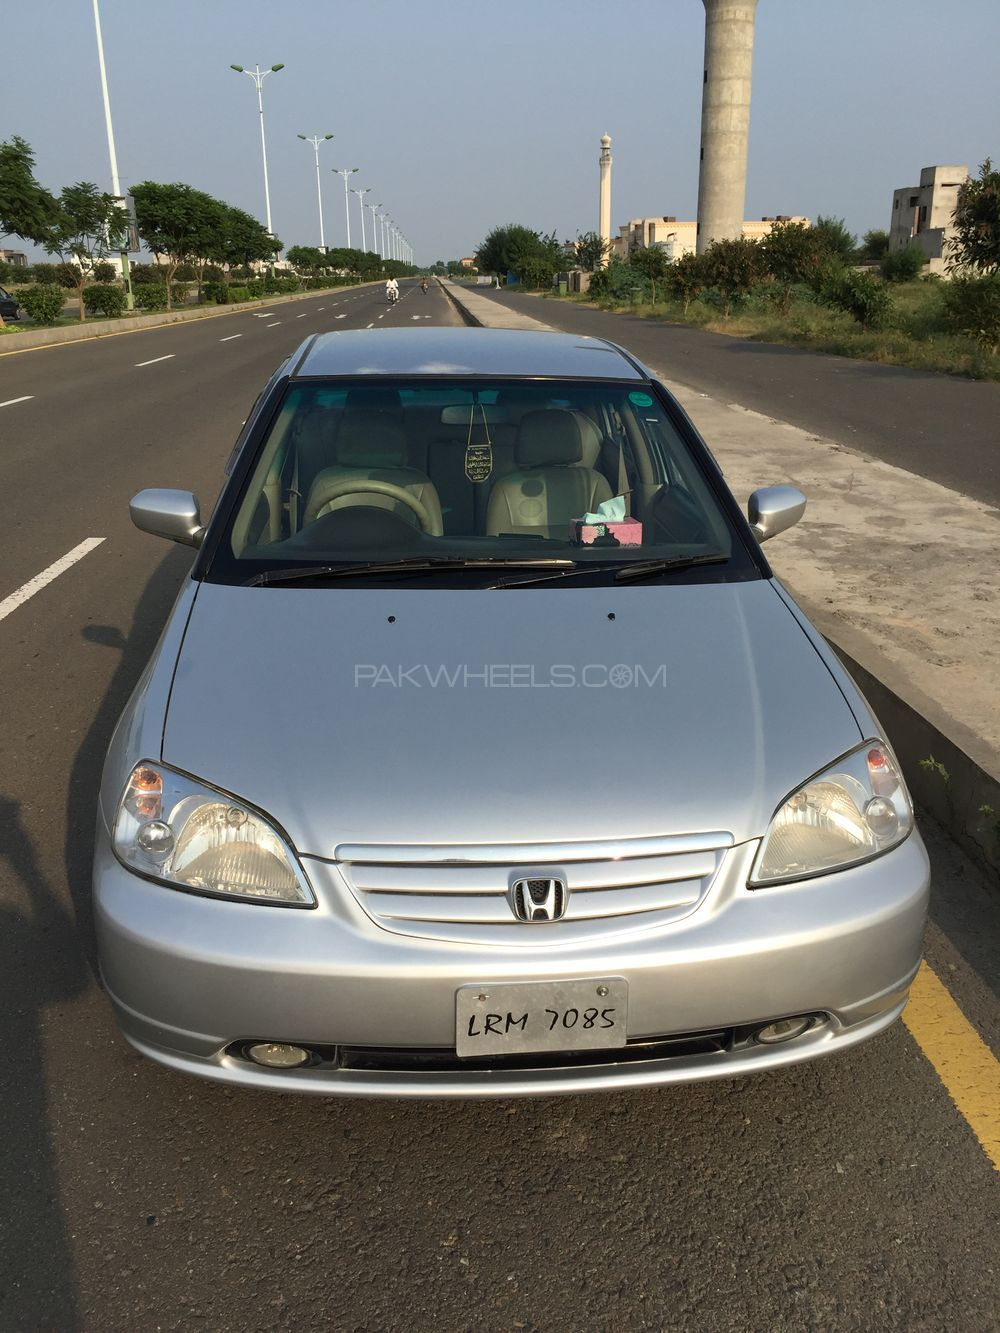 Honda Civic VTi Prosmatec 1.6 2003 Image-2